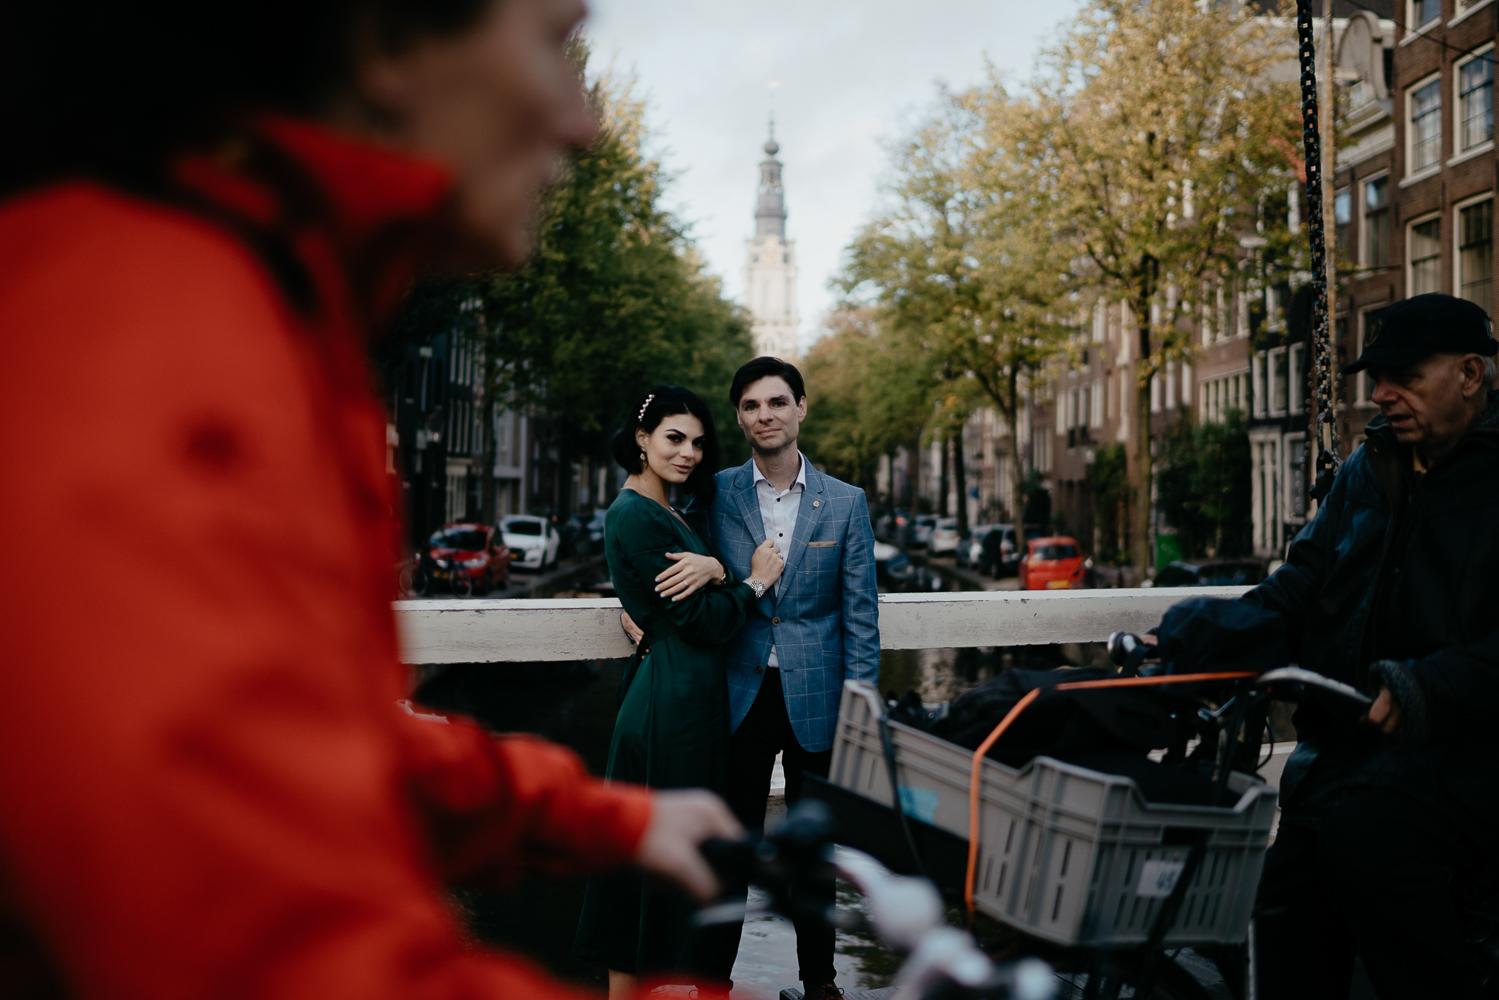 amsterdam-bruidsfotografie-huwelijk-hortus-botanicus-Ambrose Benjamin-117.jpg